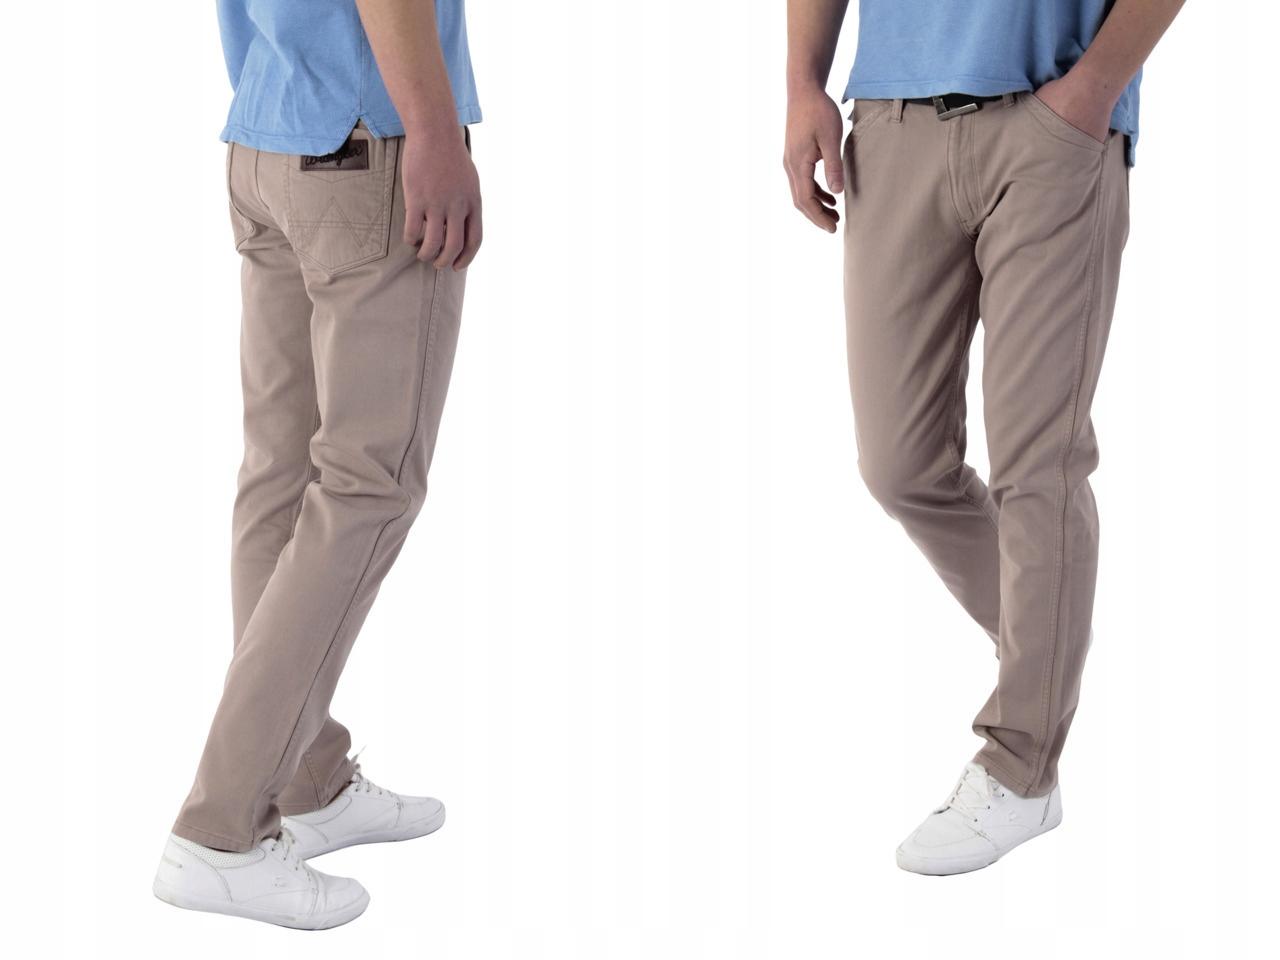 Wrangler Greensboro Modern Regular spodnie W34 L32